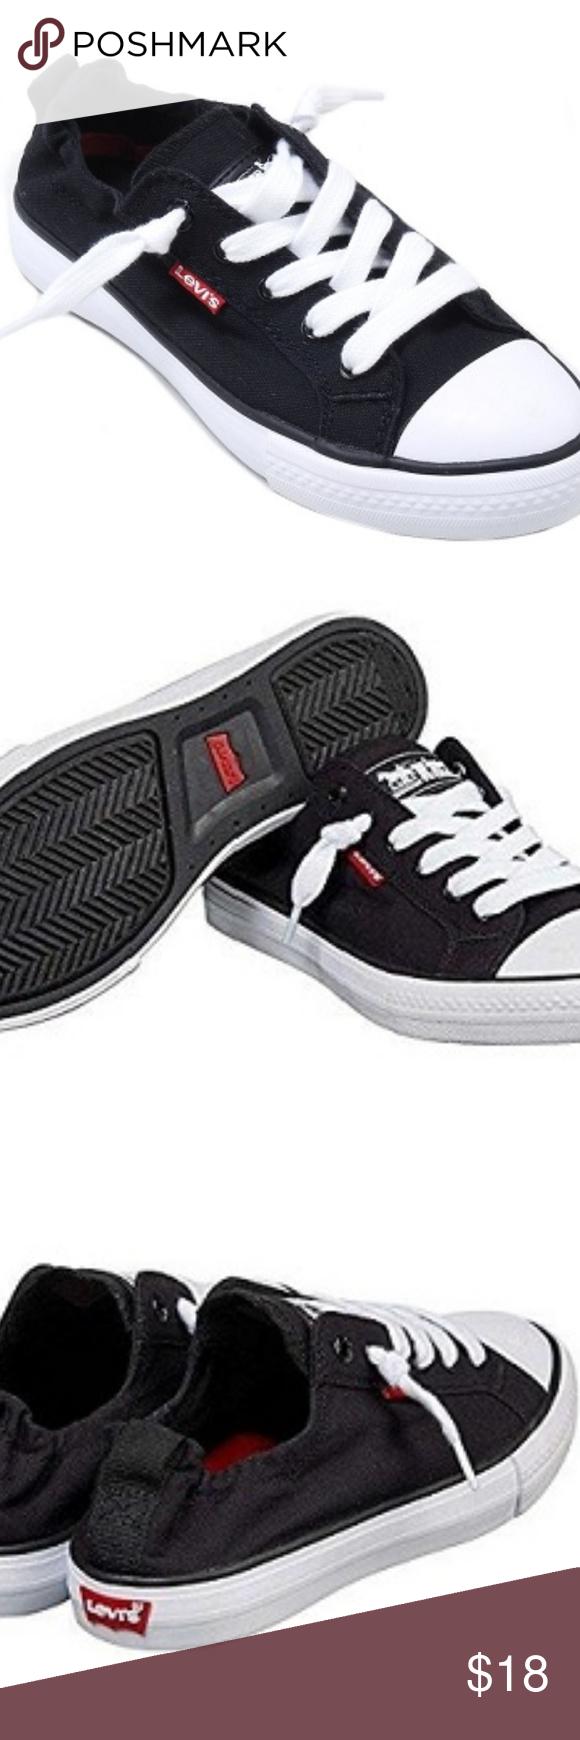 3a608ec6 Levi's Women's Stan G Comfort Sneaker Comfort Tech Insole - Comfort Tech  removable insole Non-Marking Rubber Outsole - Non-marking rubber outsole  Colors: ...